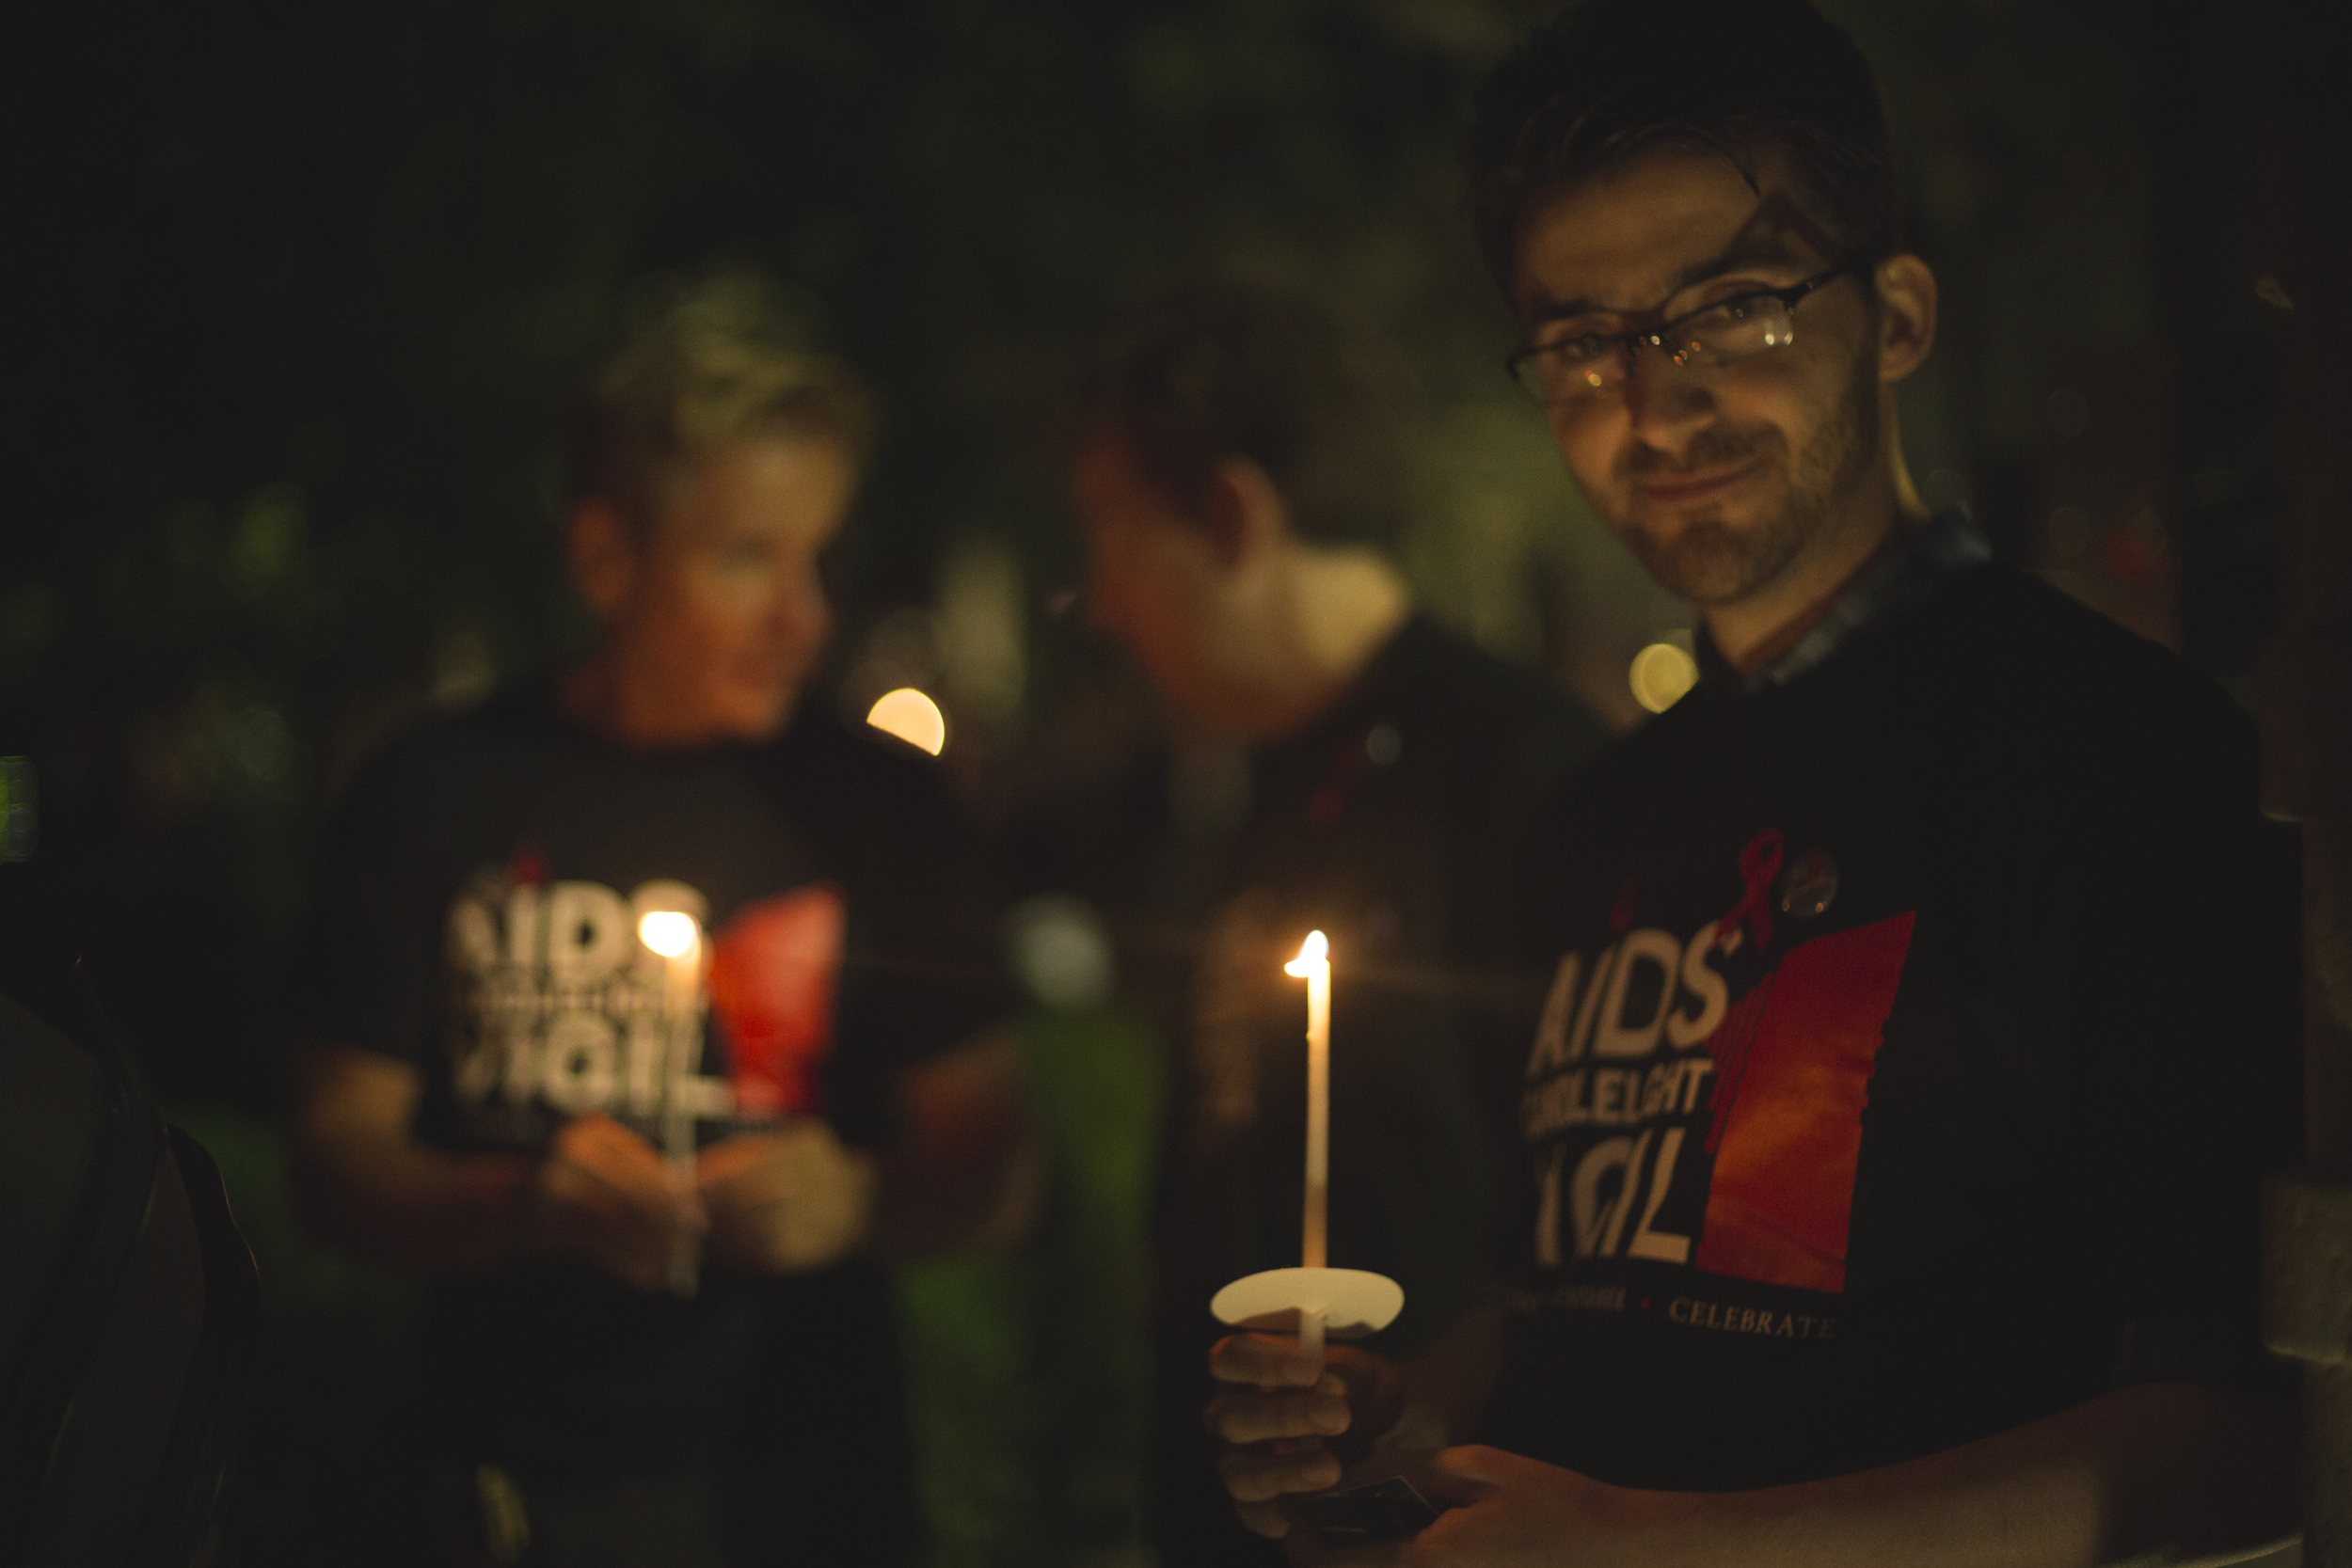 Pride_Toronto_2015_AIDS_Vigil_by_Indeana_Underhill-28.jpg